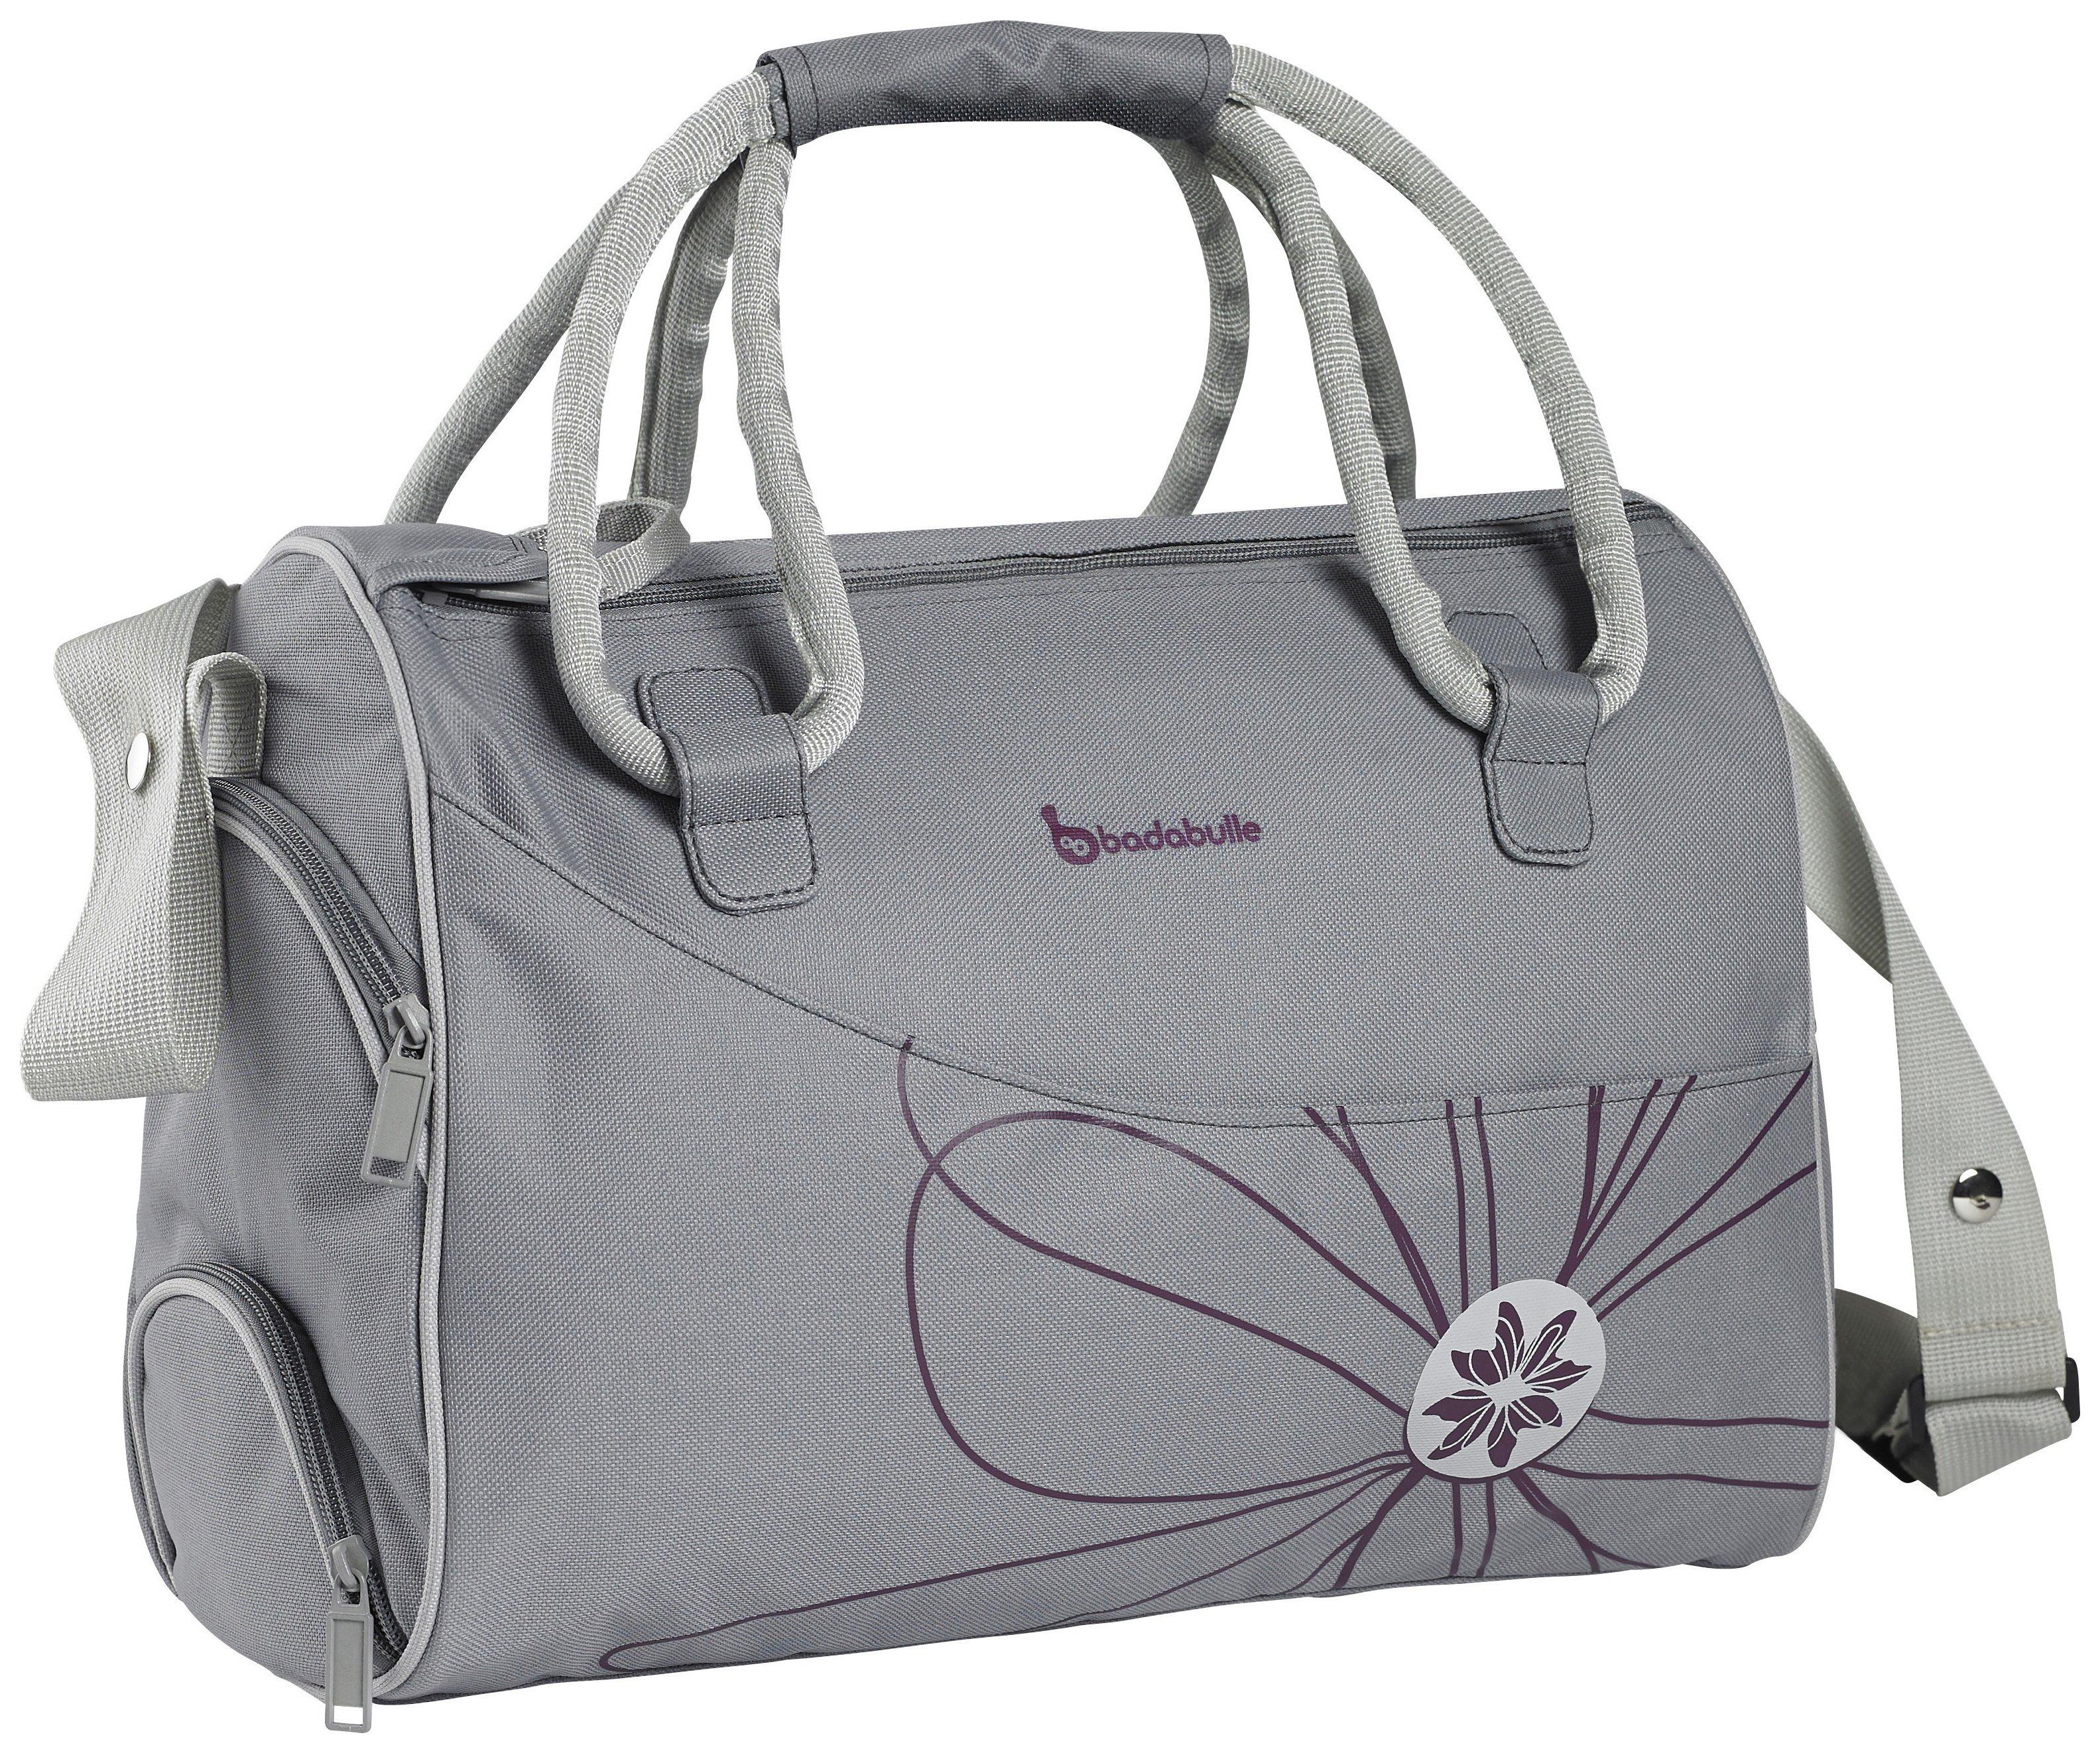 Image of Badabulle Bowling - Changing Bag - Grey